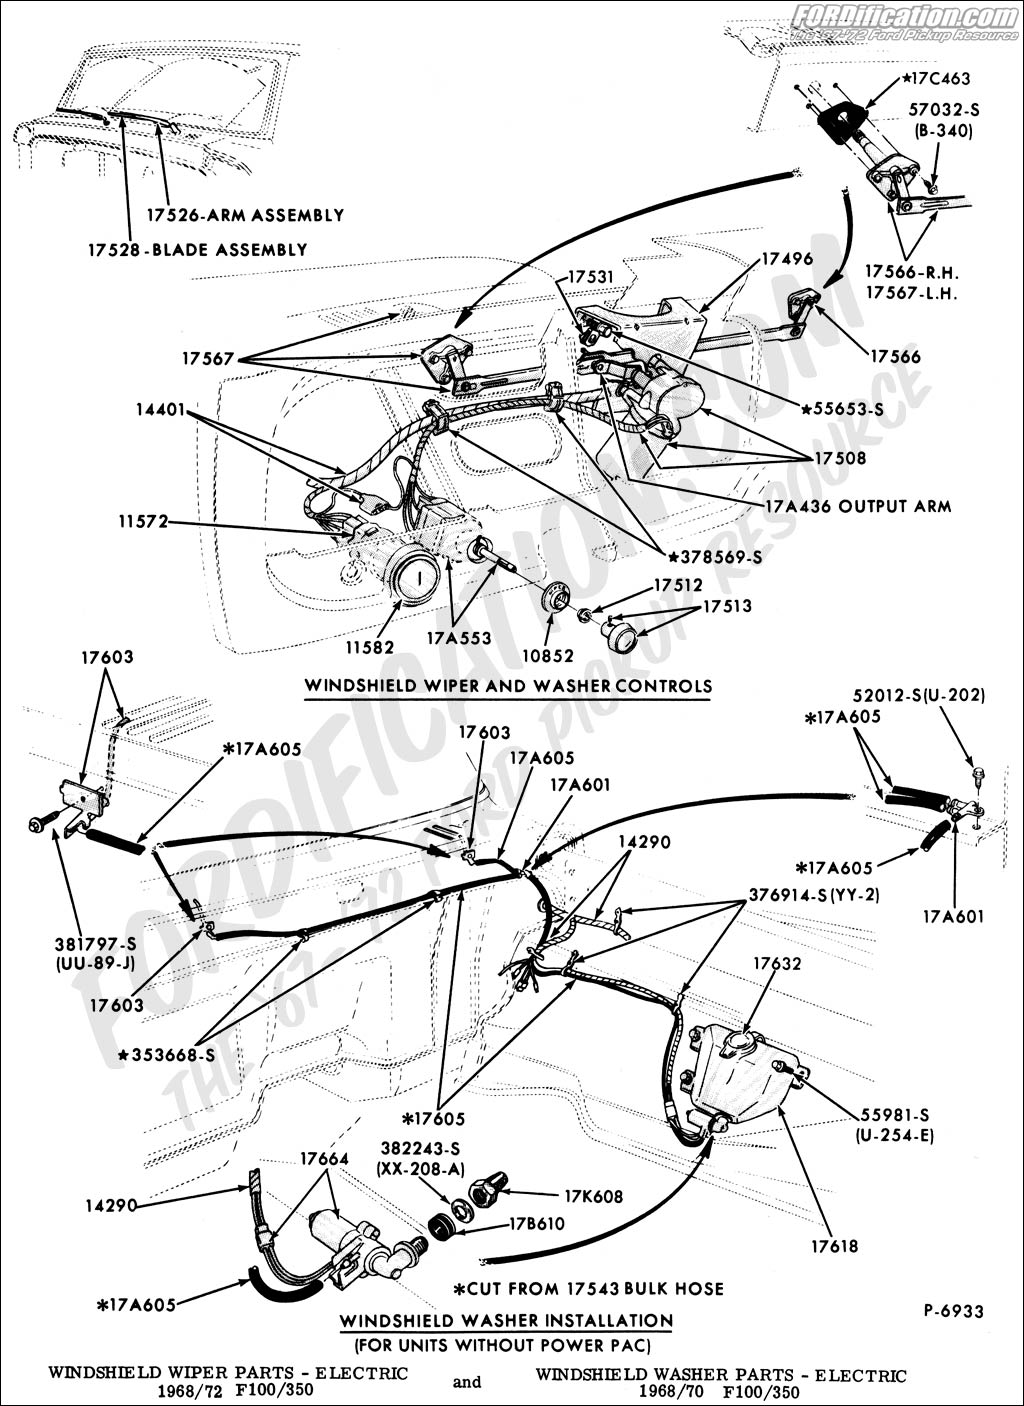 1968 chevy wiper motor wiring diagram genesis motor bedradingsschema auto electrical wiring diagram  auto electrical wiring diagram